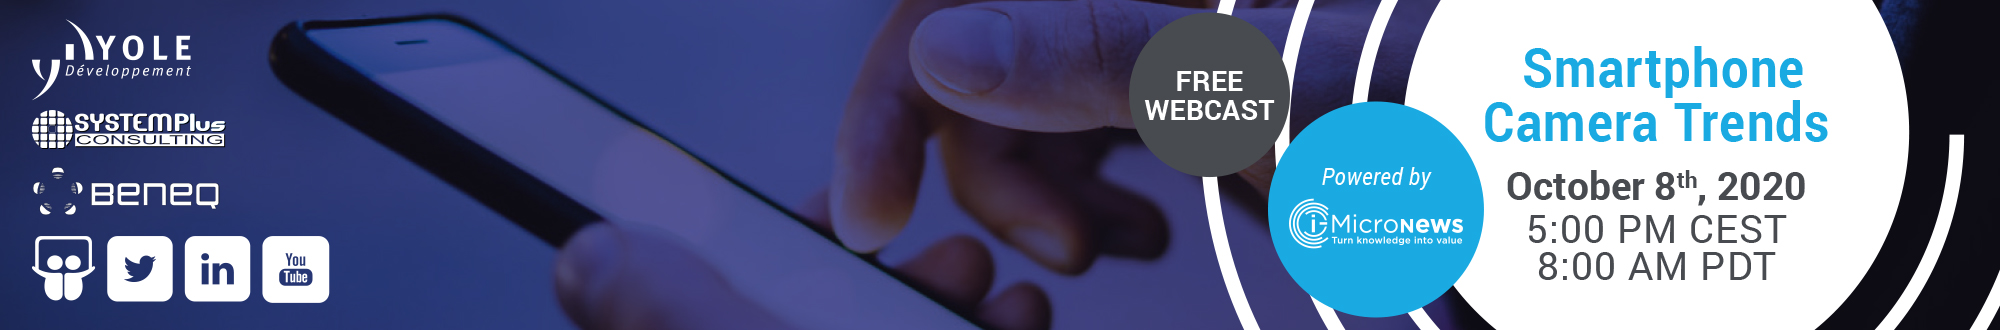 Smartphone Camera Trends – Webcast